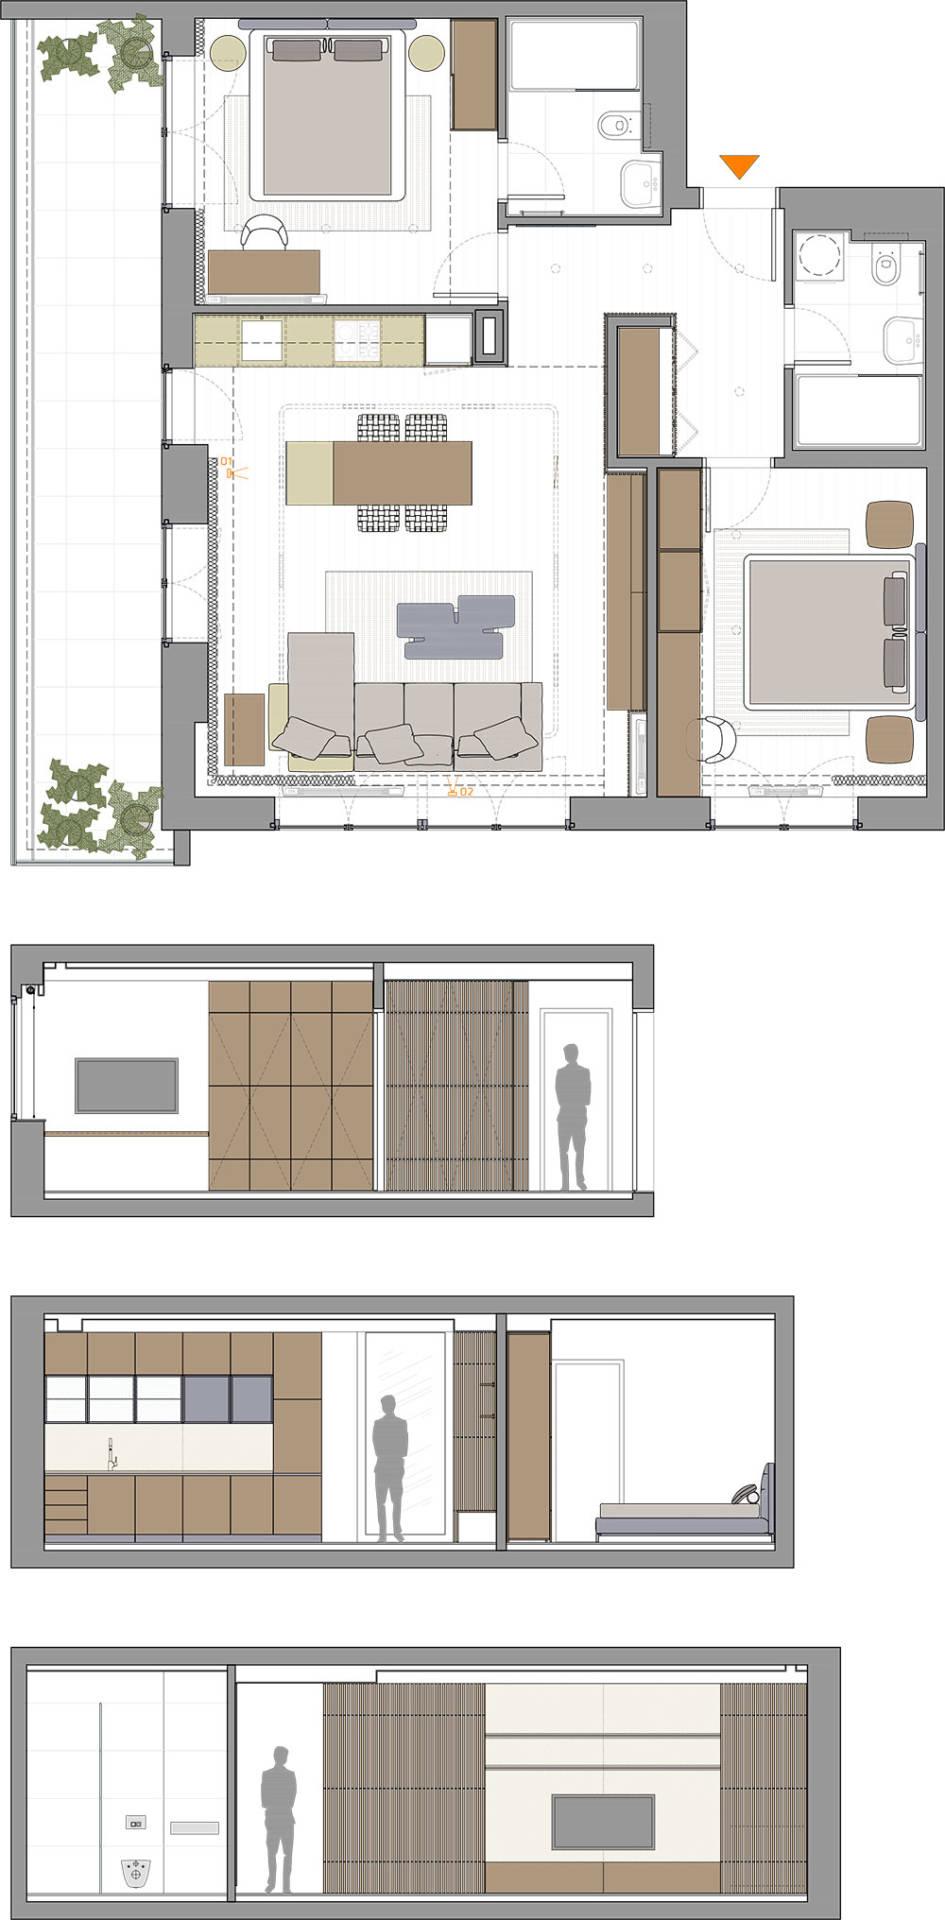 apartman-vb-03-drawing